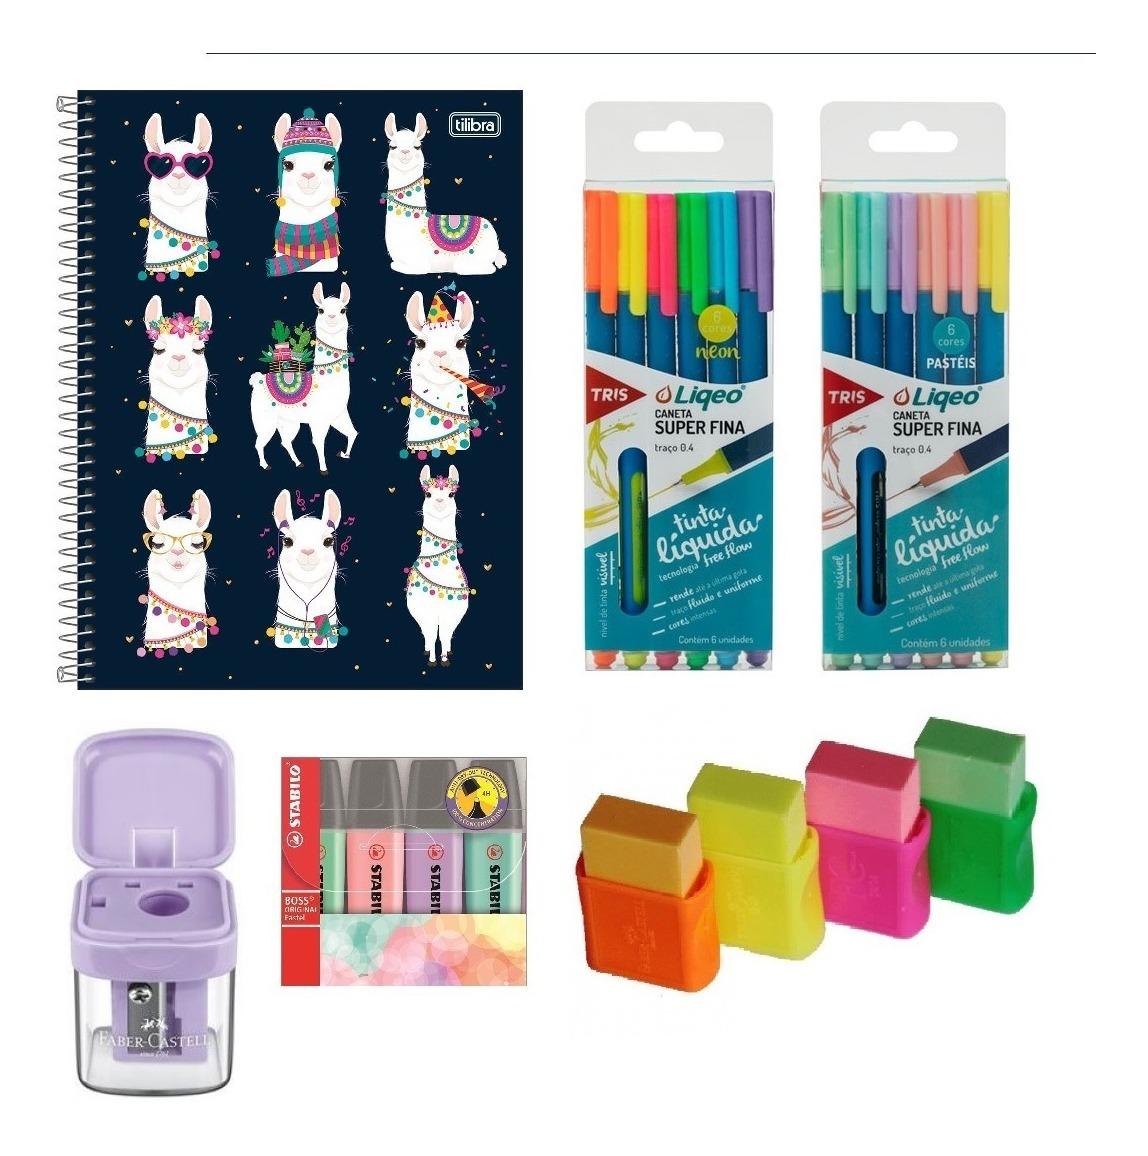 Kit Caderno Lhama + Pens + Borrachas Neon + Apontador Pastel